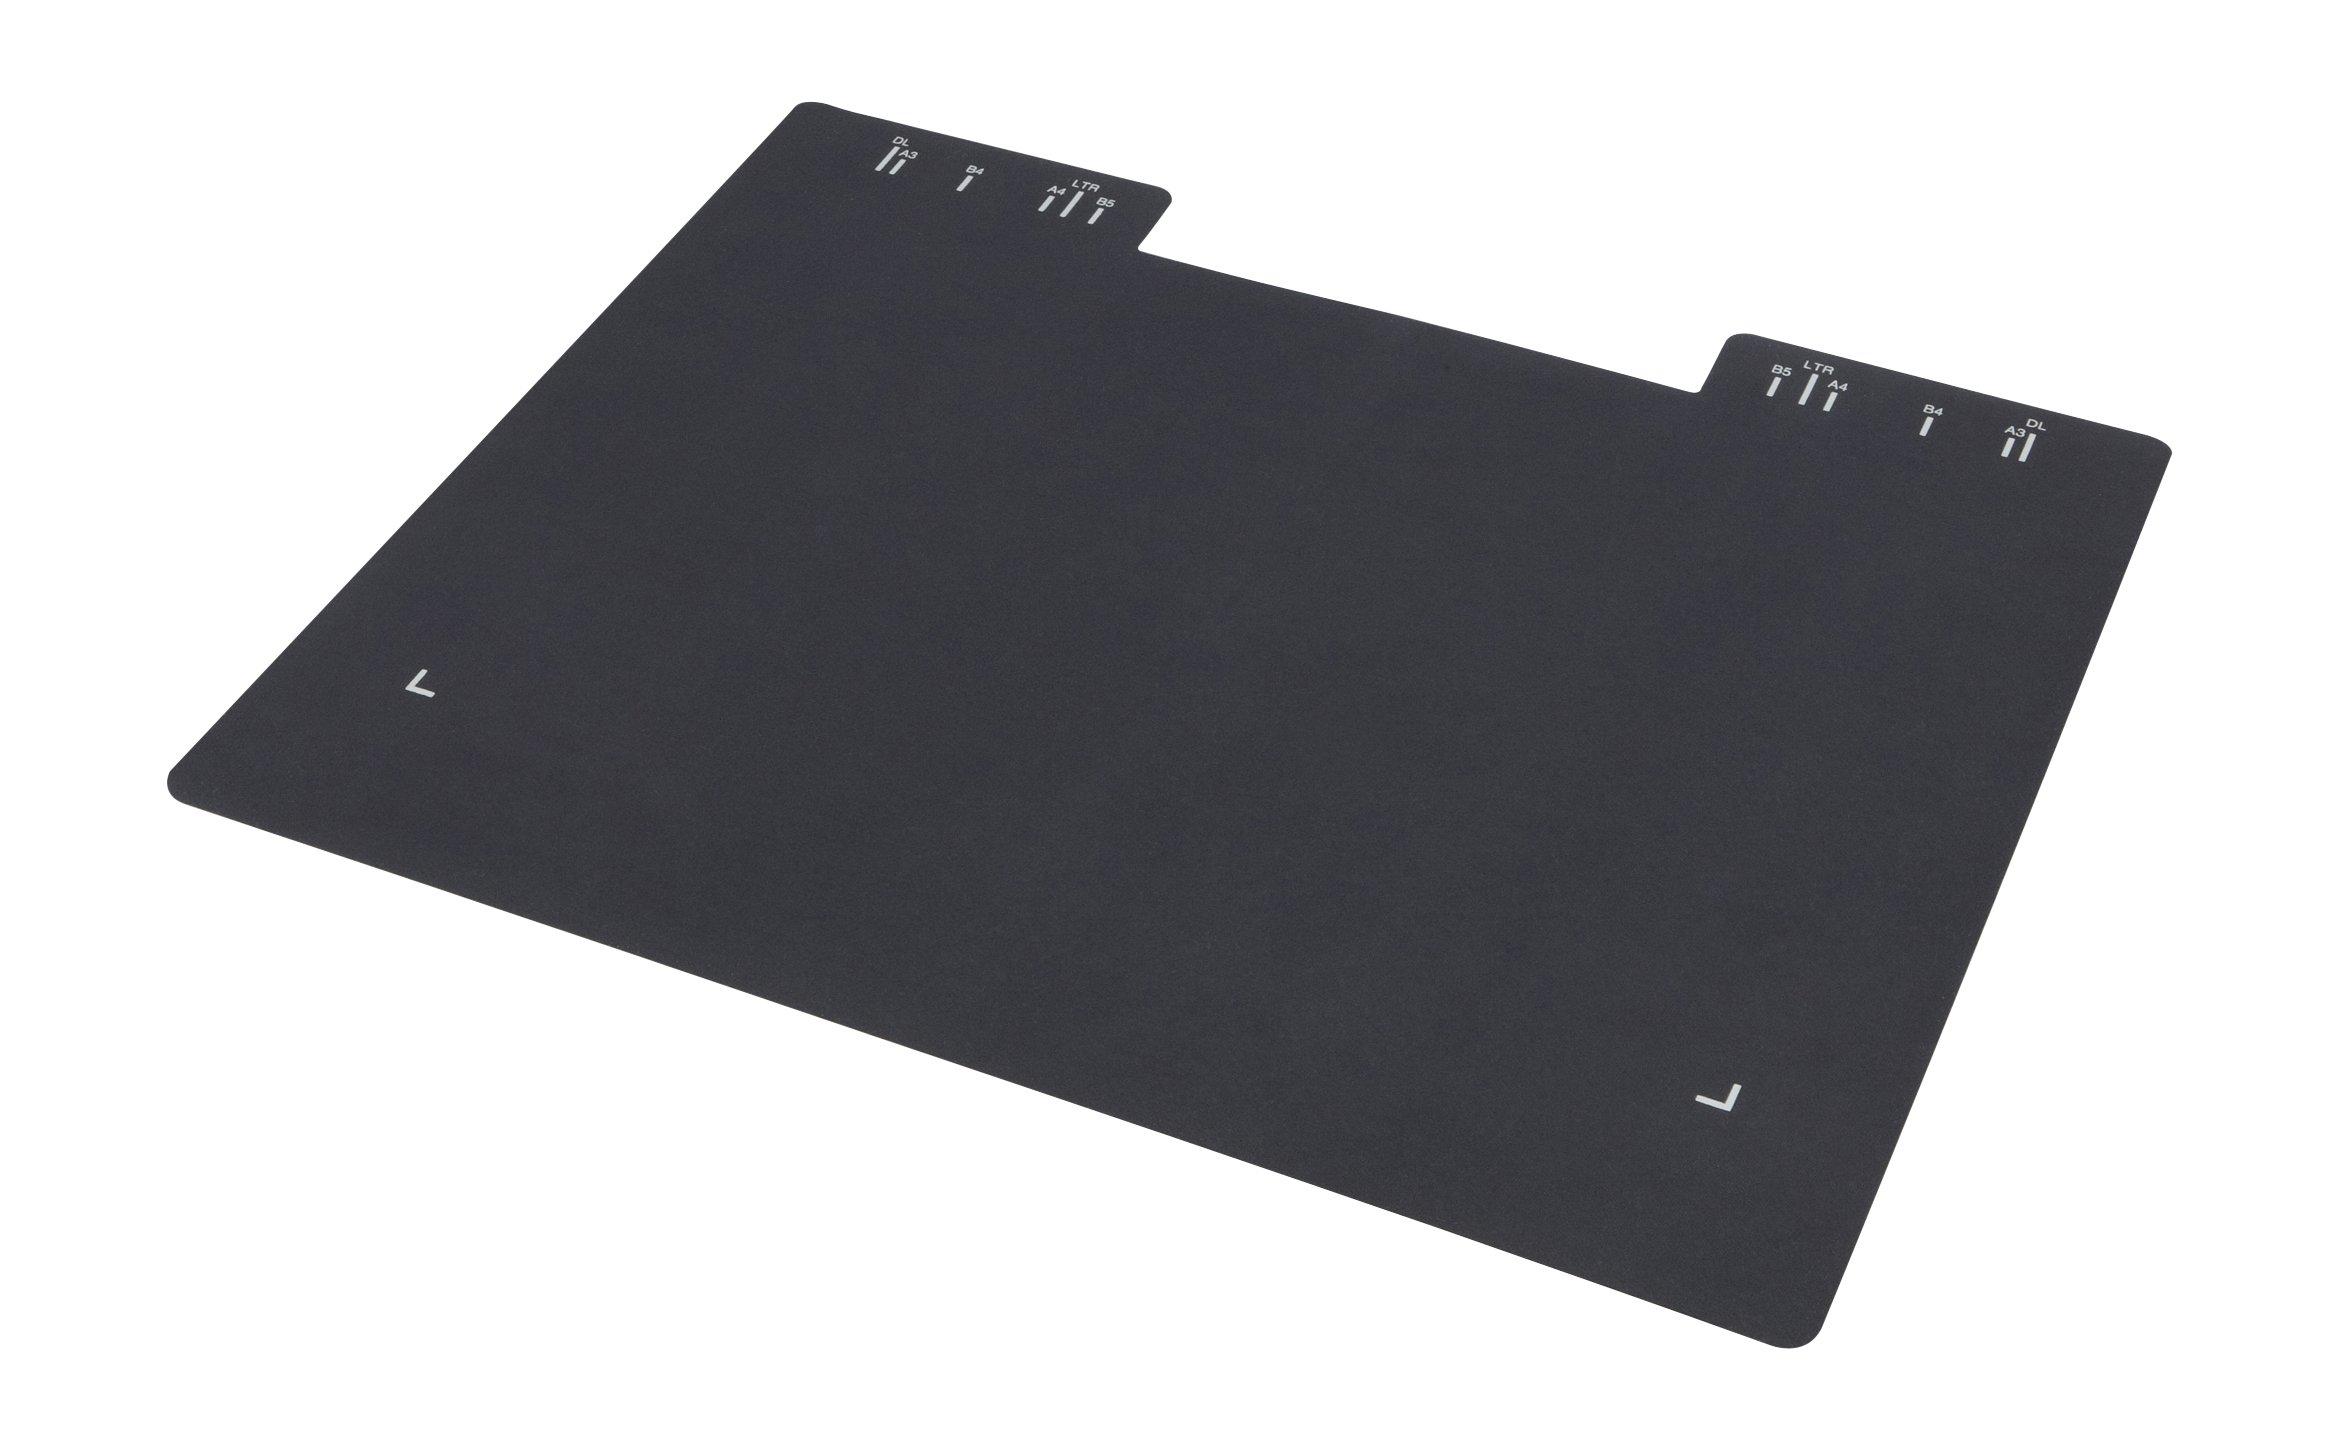 Fujitsu PA03641-0052 Background Pad for SV-600 by Fujitsu